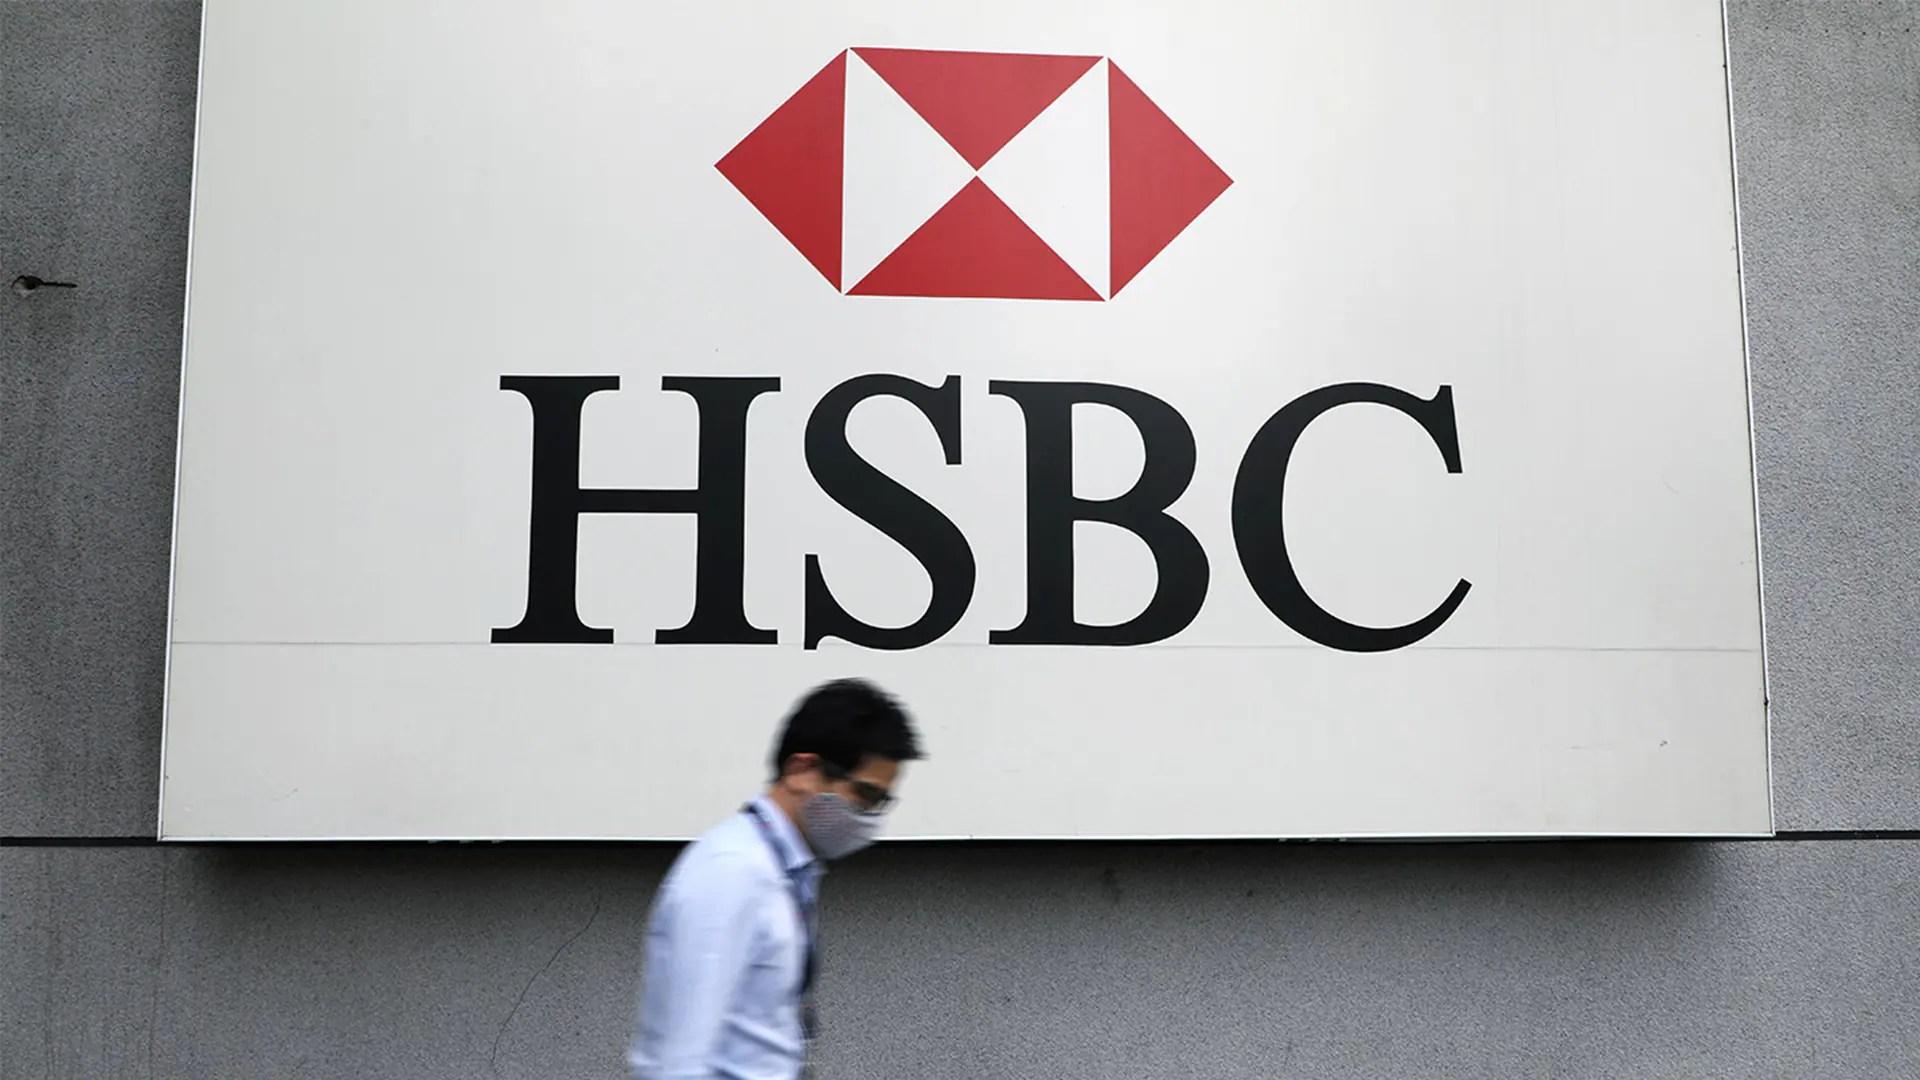 HSBC handled $4.4B in suspicious money: ICIJ investigation